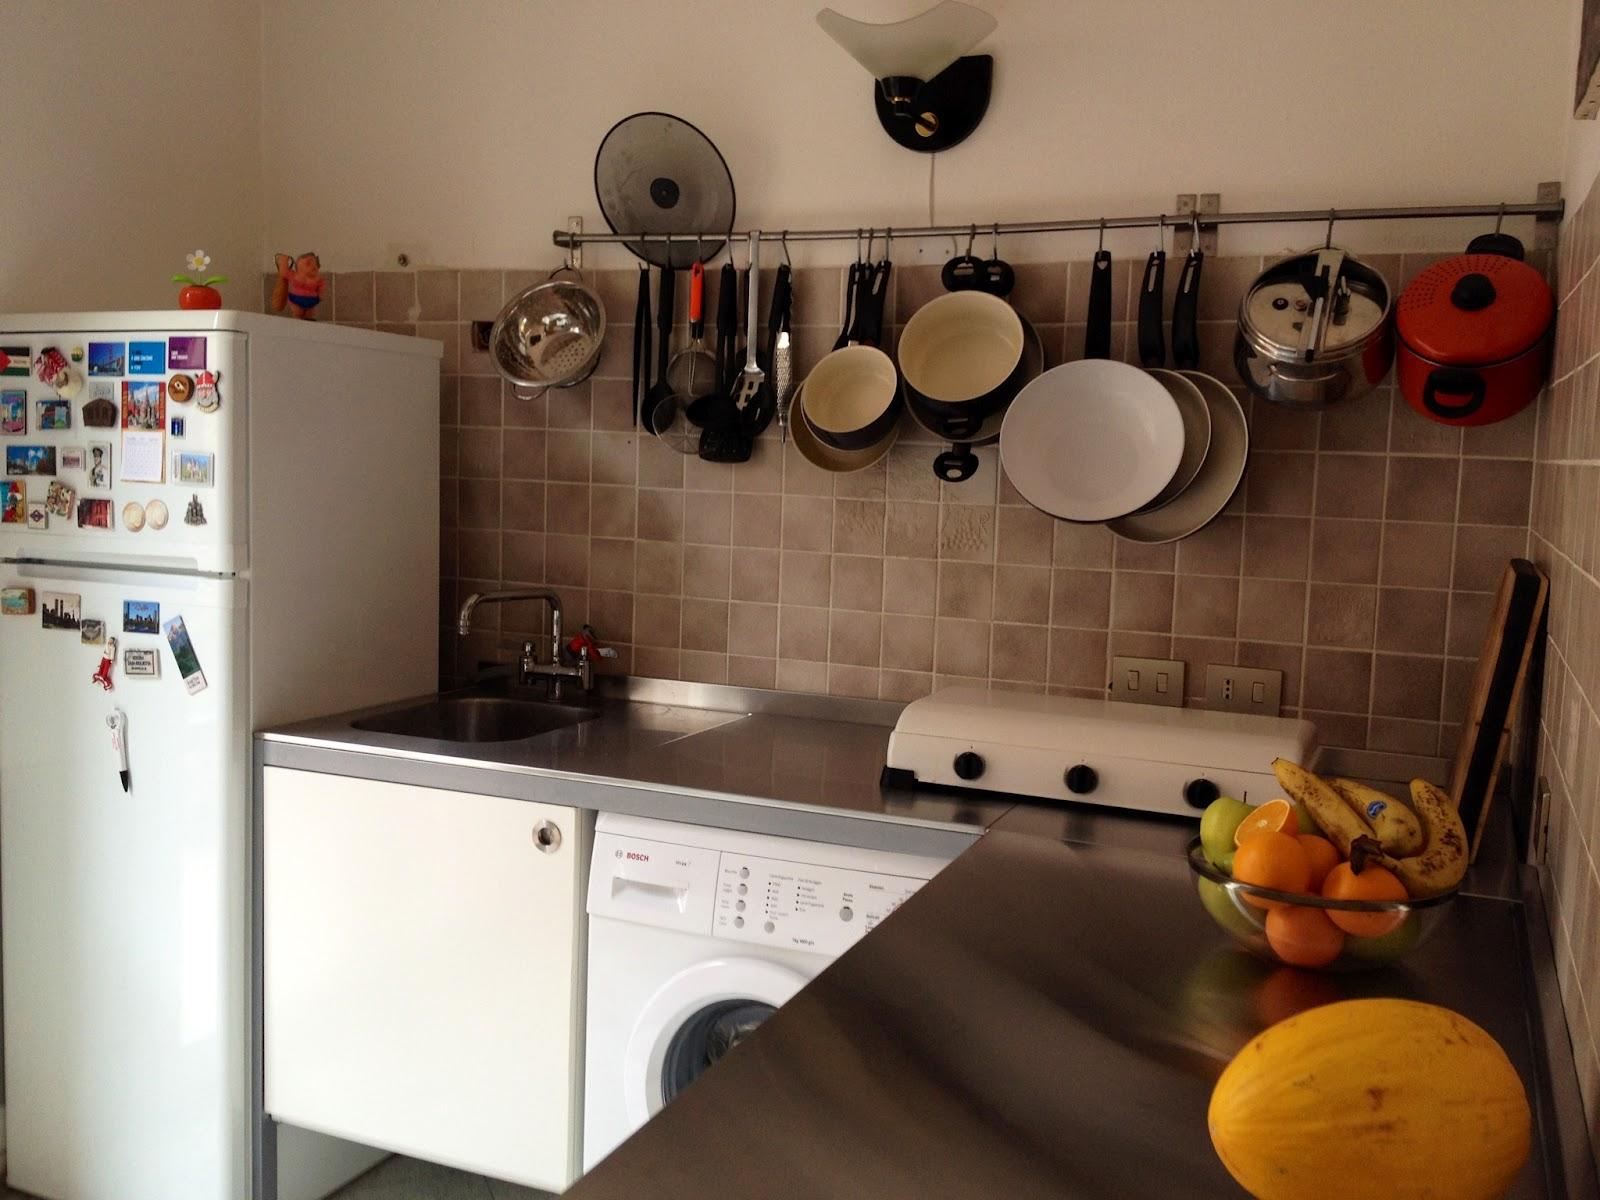 Blanca e fulvio traslocano - Ikea barra cucina ...